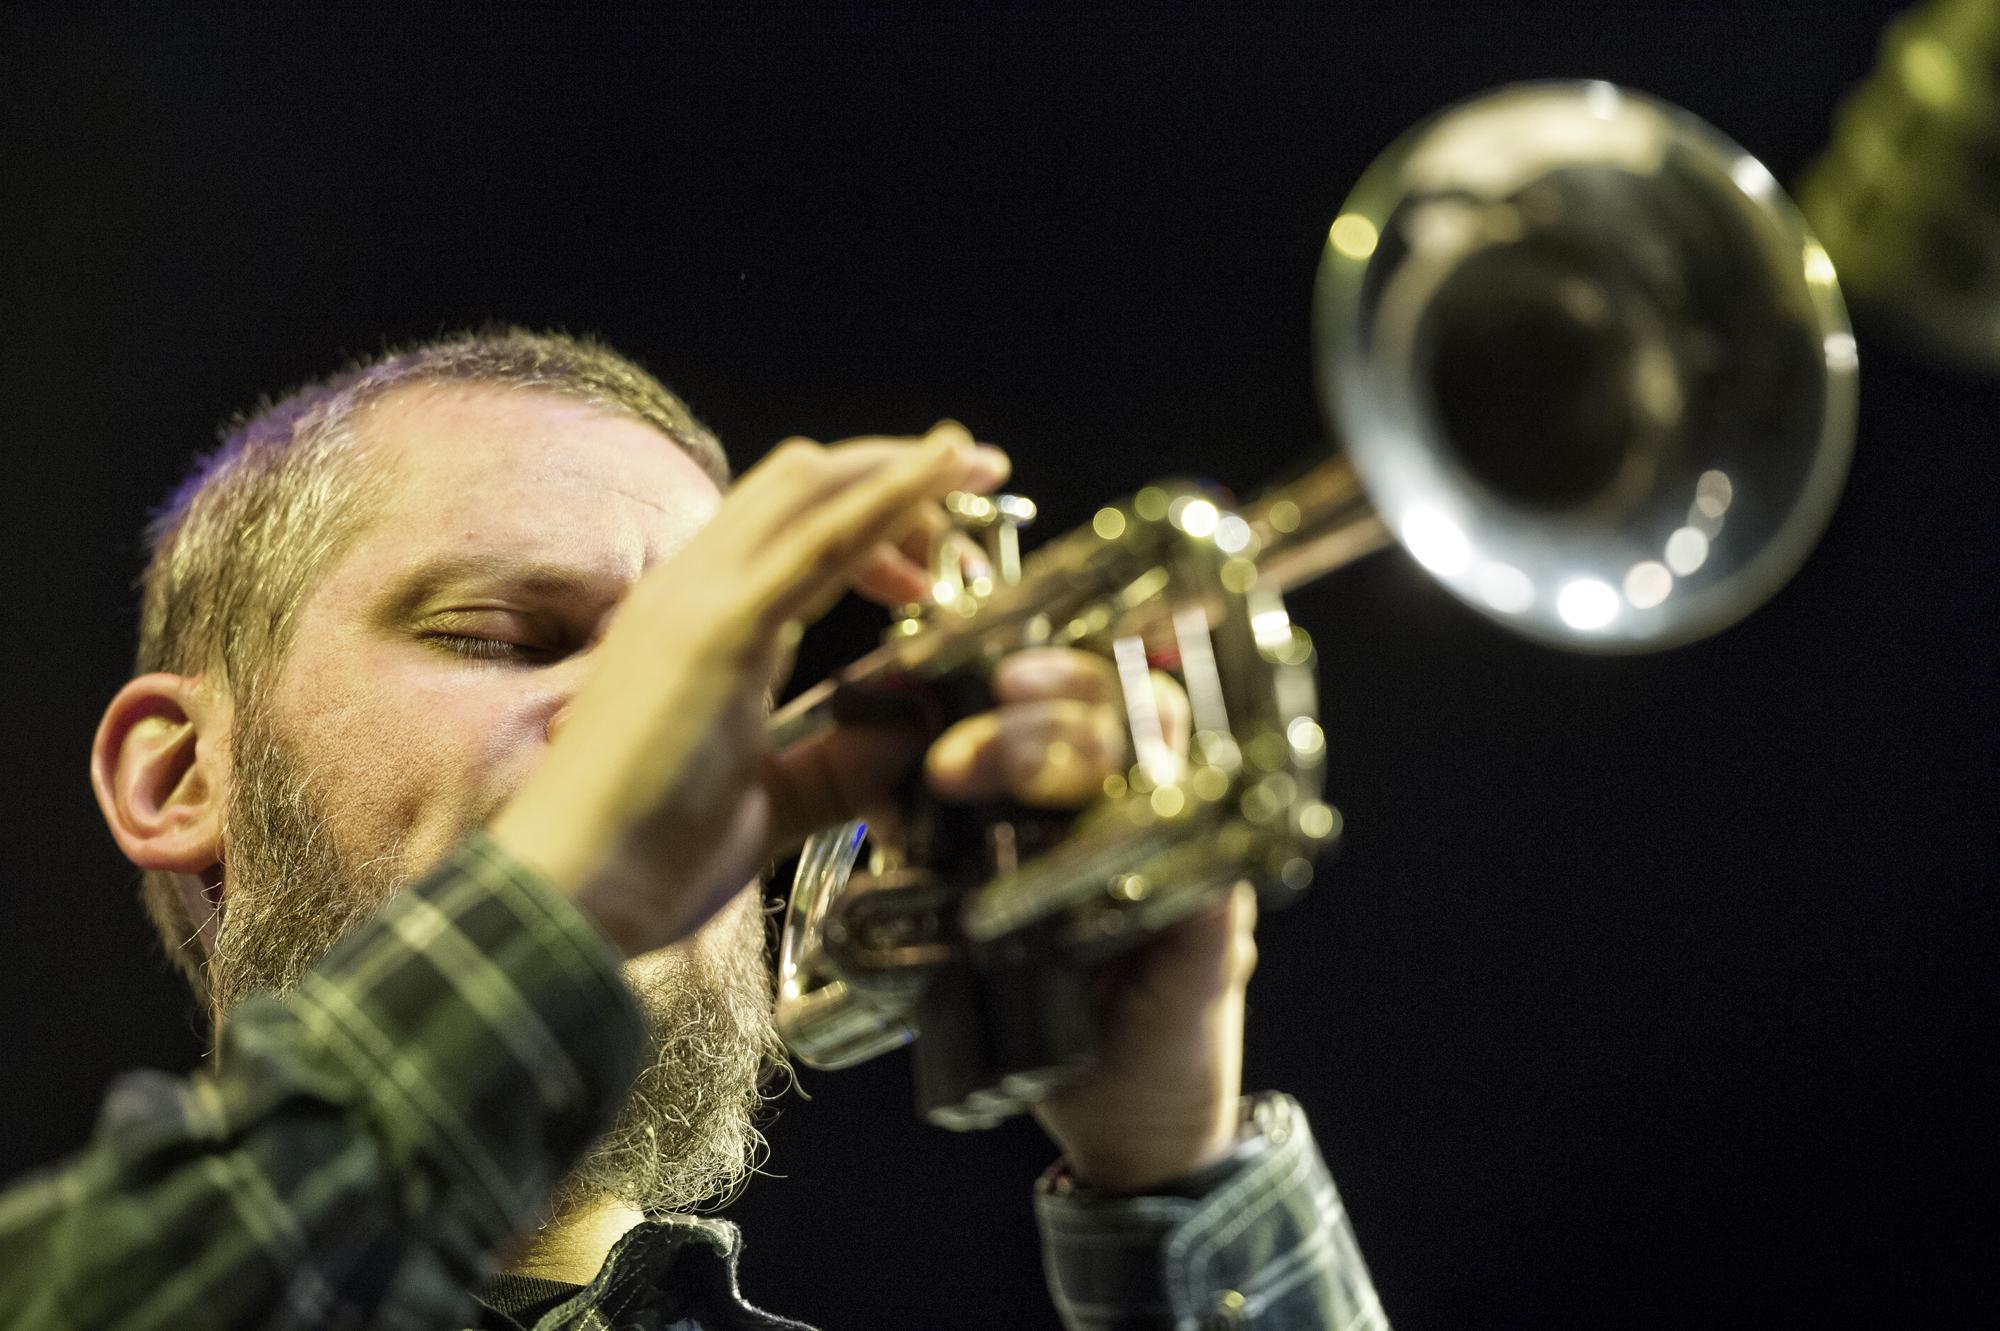 Nate Wooley playing a trumpet (photo by Ziga Koritnik)